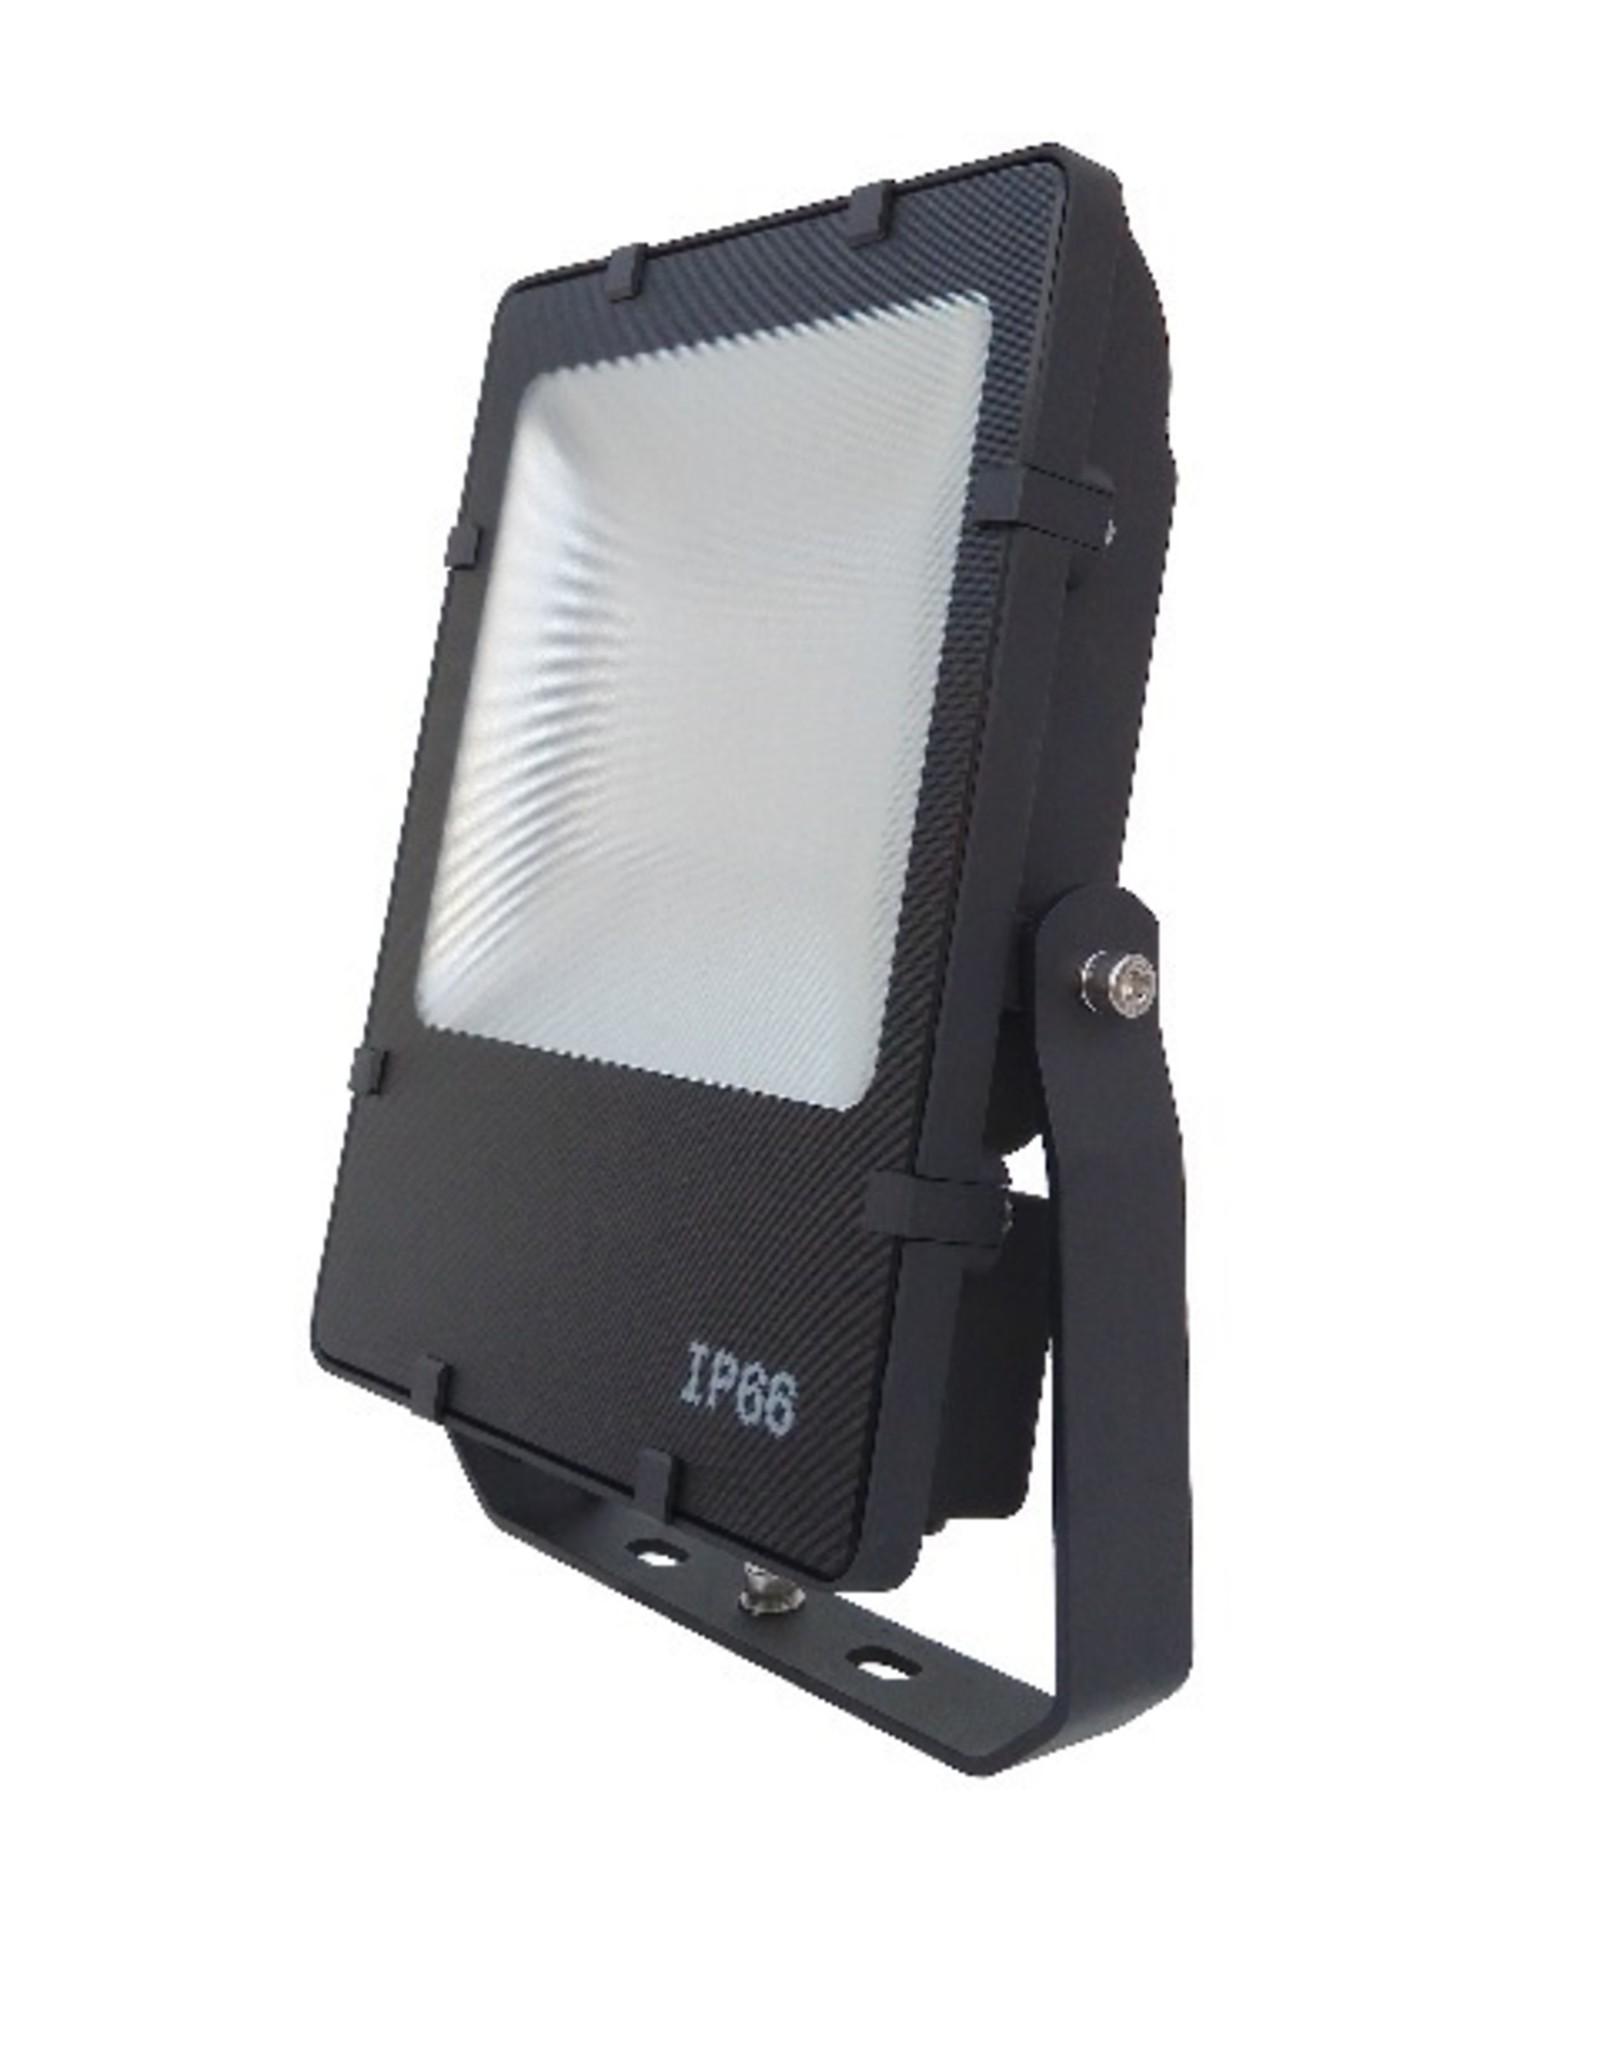 LedLed LED Swelo Schijnwerper IP66 150W 5700k